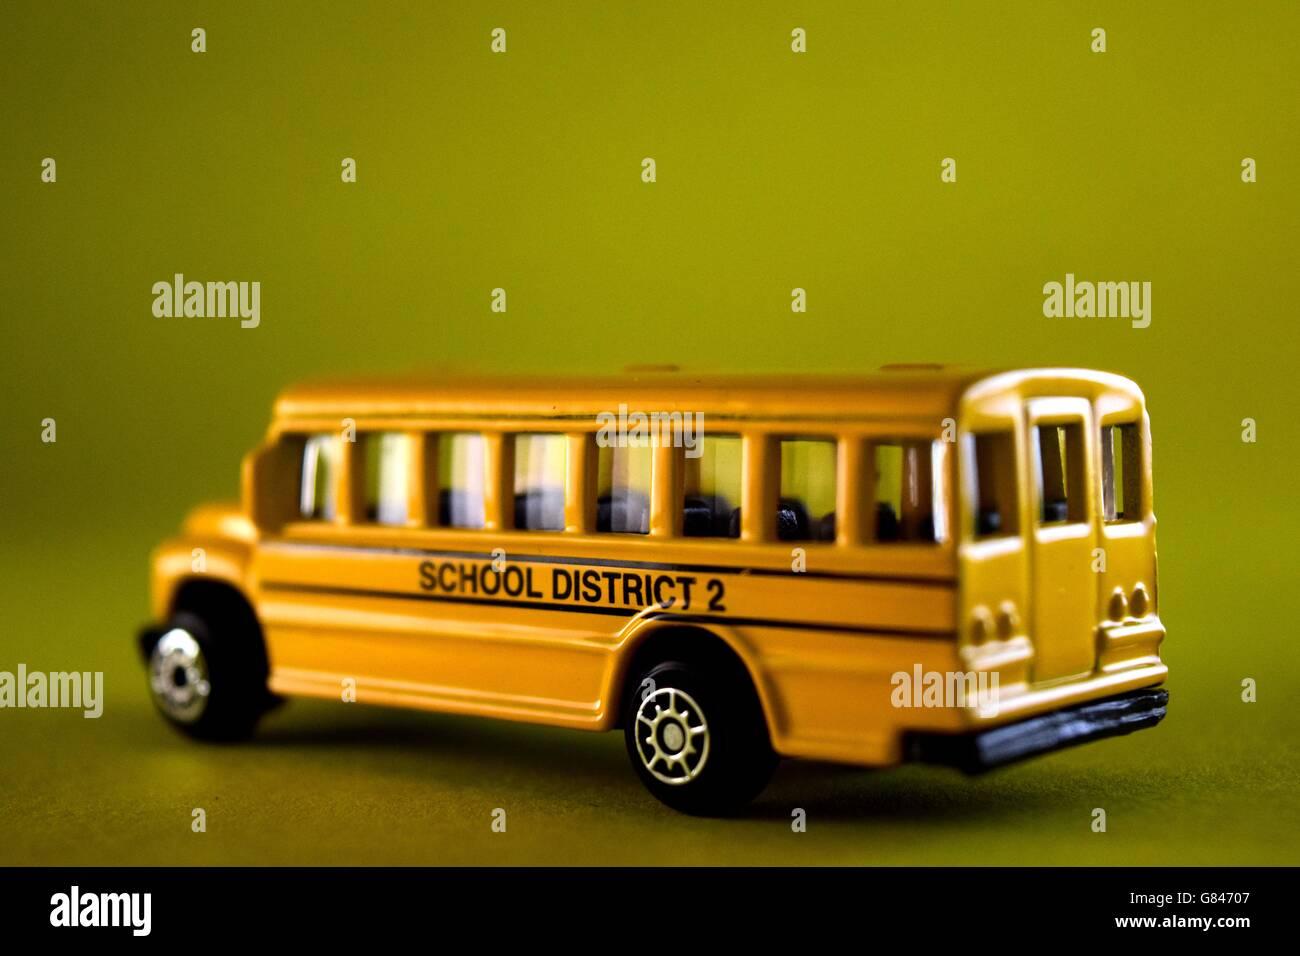 yellow bus school bus,Plain Background, Bus, Red, Souvenir, Single Object, Toy, Double Decker Bus, British Culture, - Stock Image